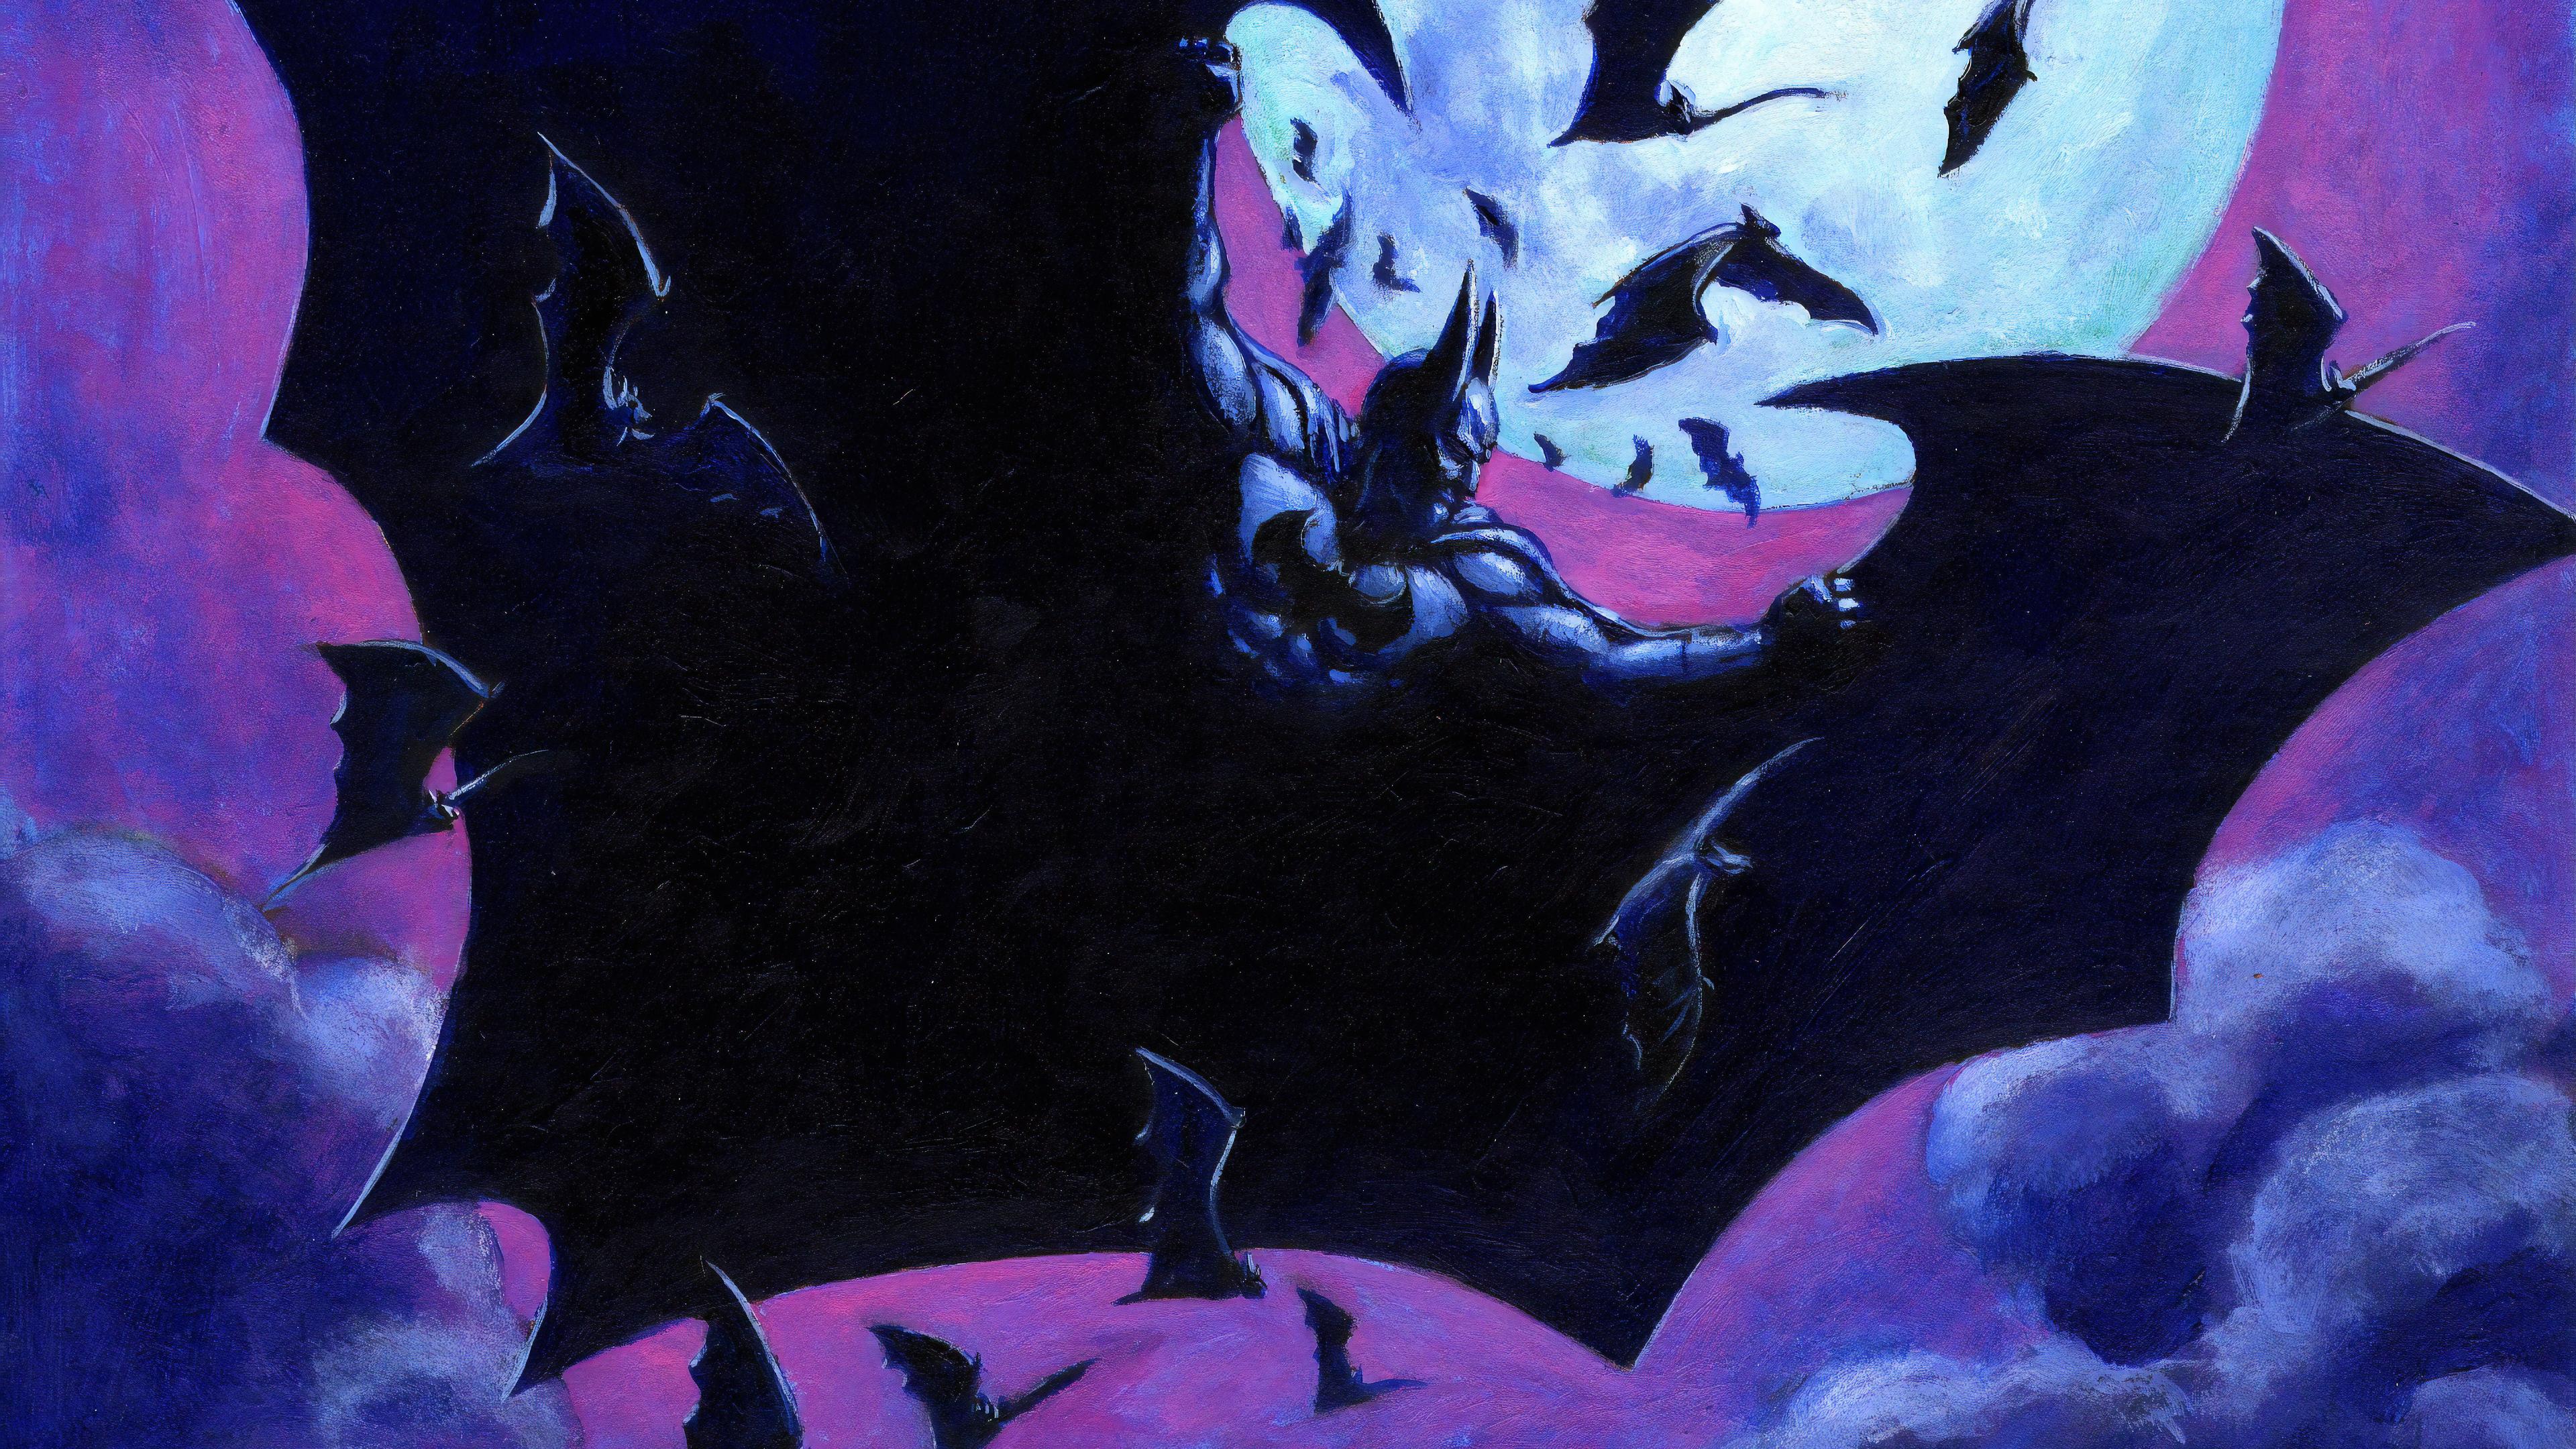 batman fly 1562105696 - Batman Fly - superheroes wallpapers, hd-wallpapers, digital art wallpapers, deviantart wallpapers, batman wallpapers, artwork wallpapers, 4k-wallpapers